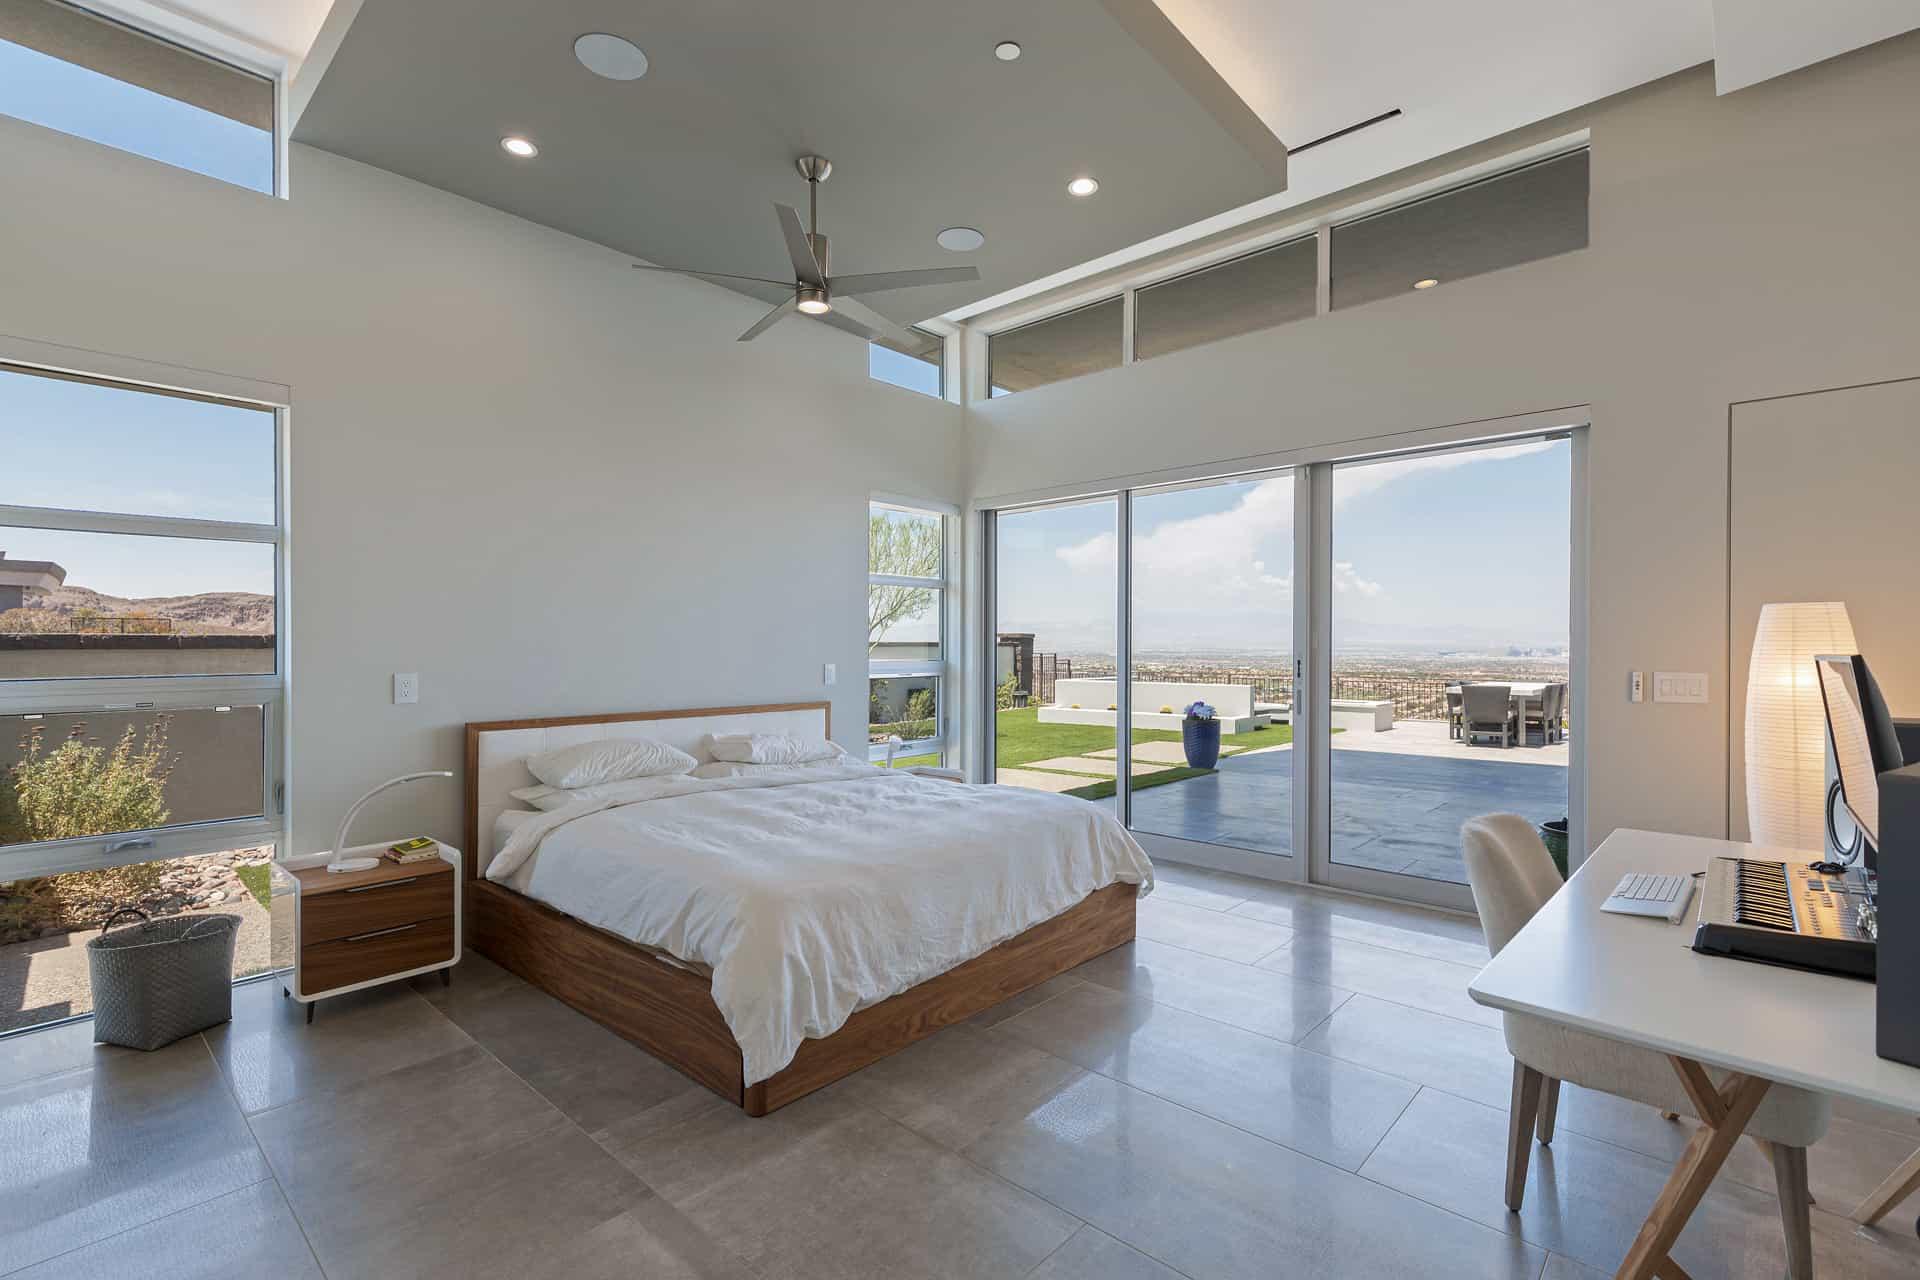 las-vegas-luxry-real-estate-realtor-rob-jensen-company-5-rockstream-drive-ascaya046